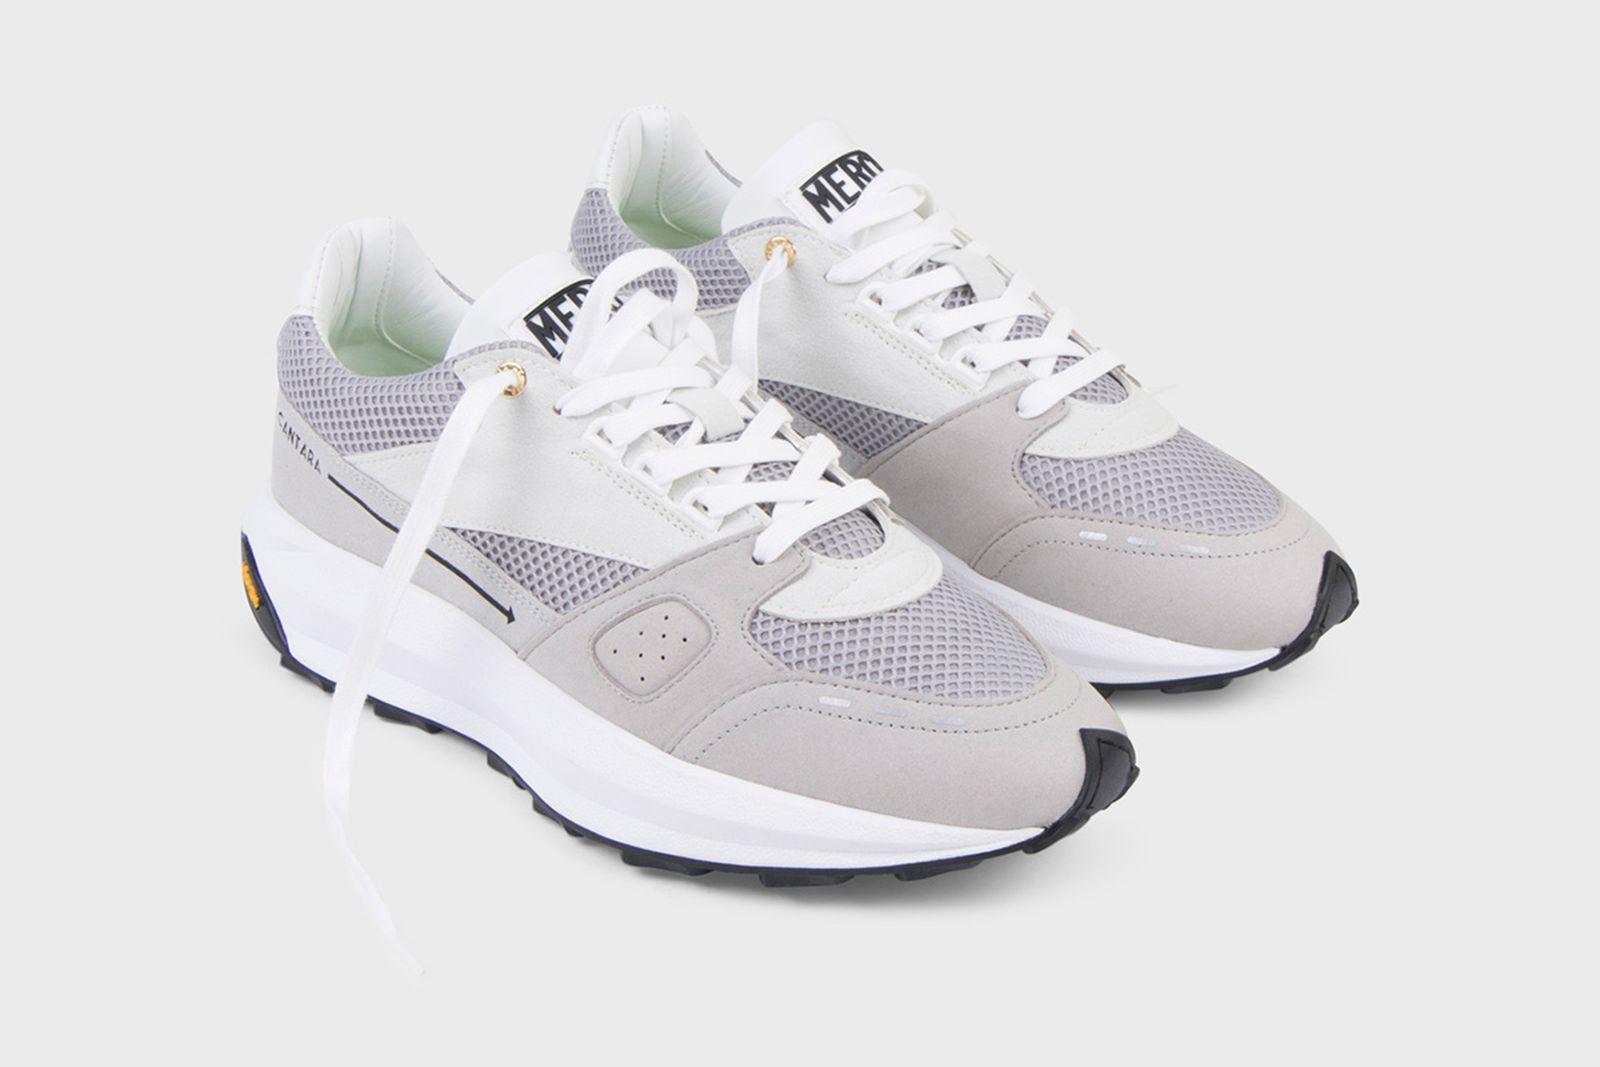 mercer-alcantara-sneaker-release-date-price-01